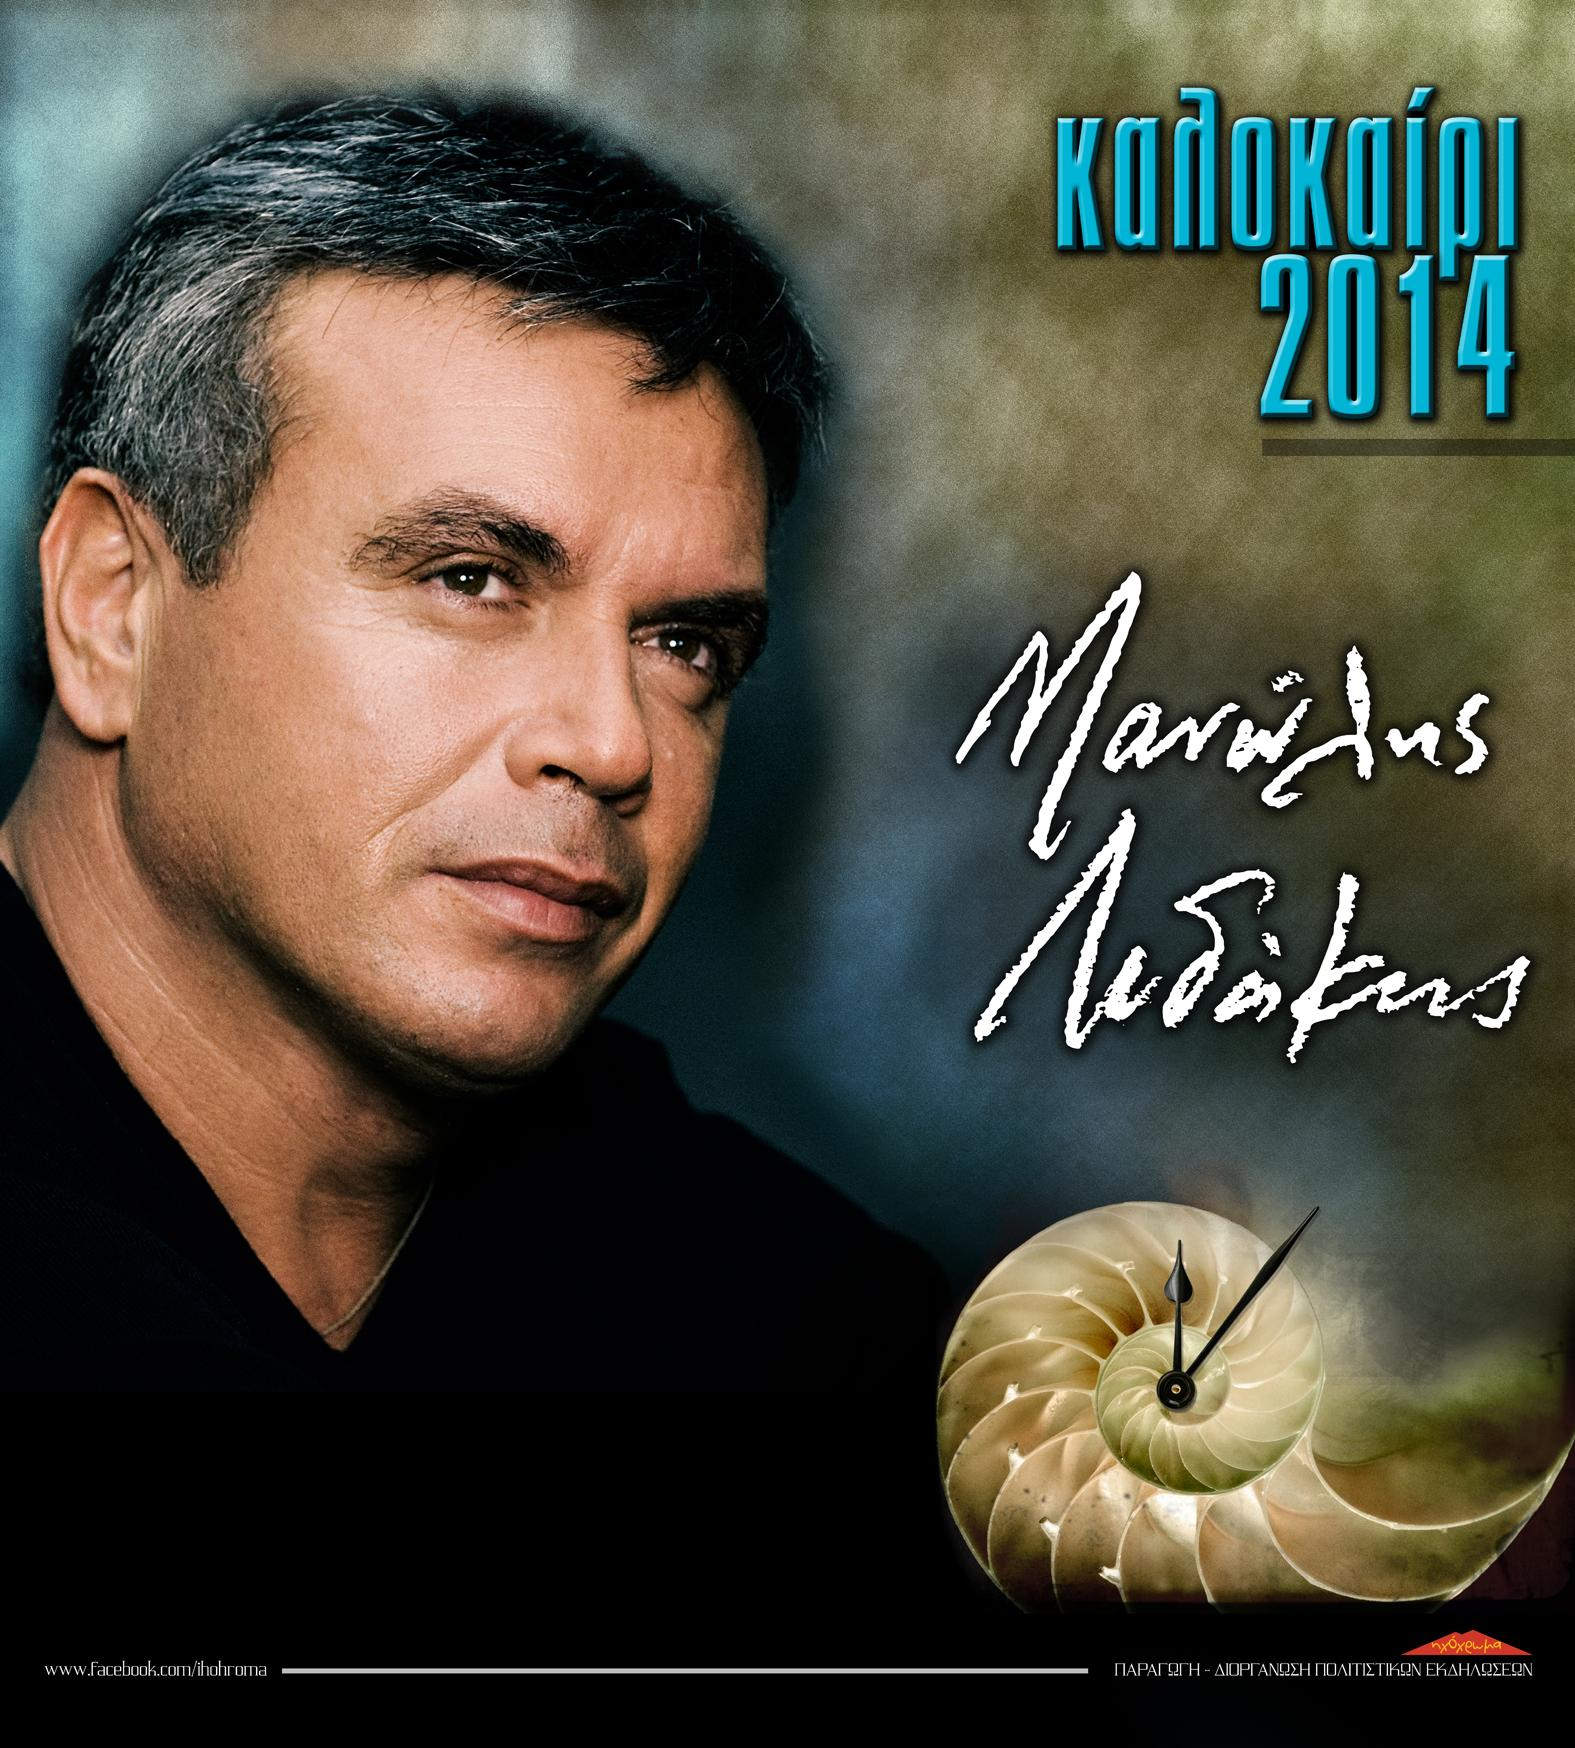 manolis-lidakis-kalokairi-2014